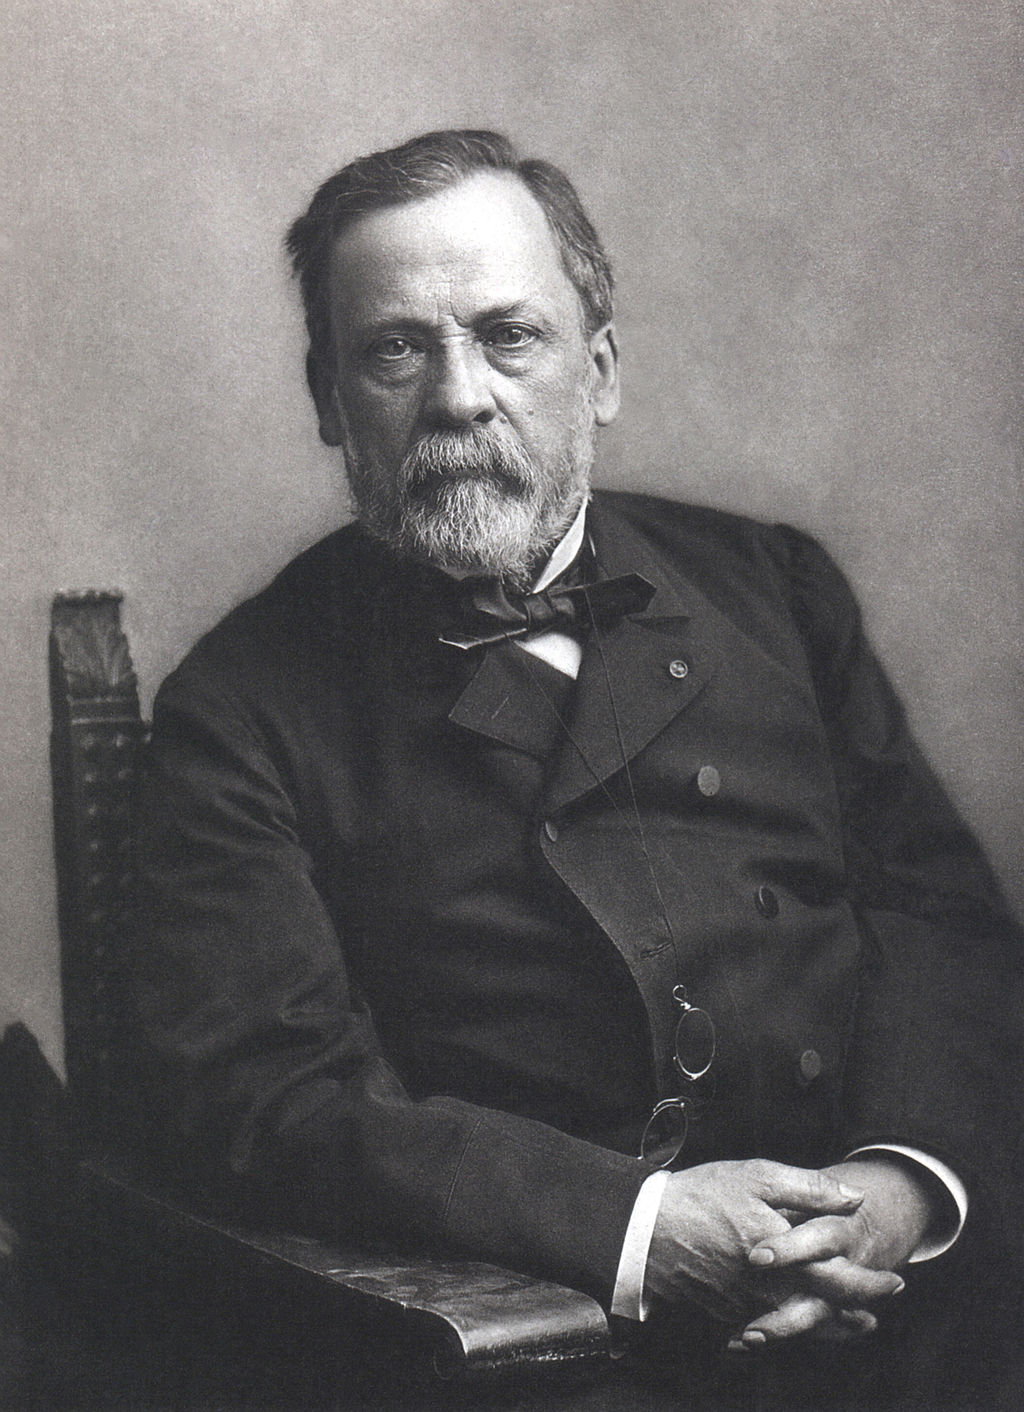 Louis_Pasteur,_foto_av_Félix_Nadar_Crisco_edit.jpg